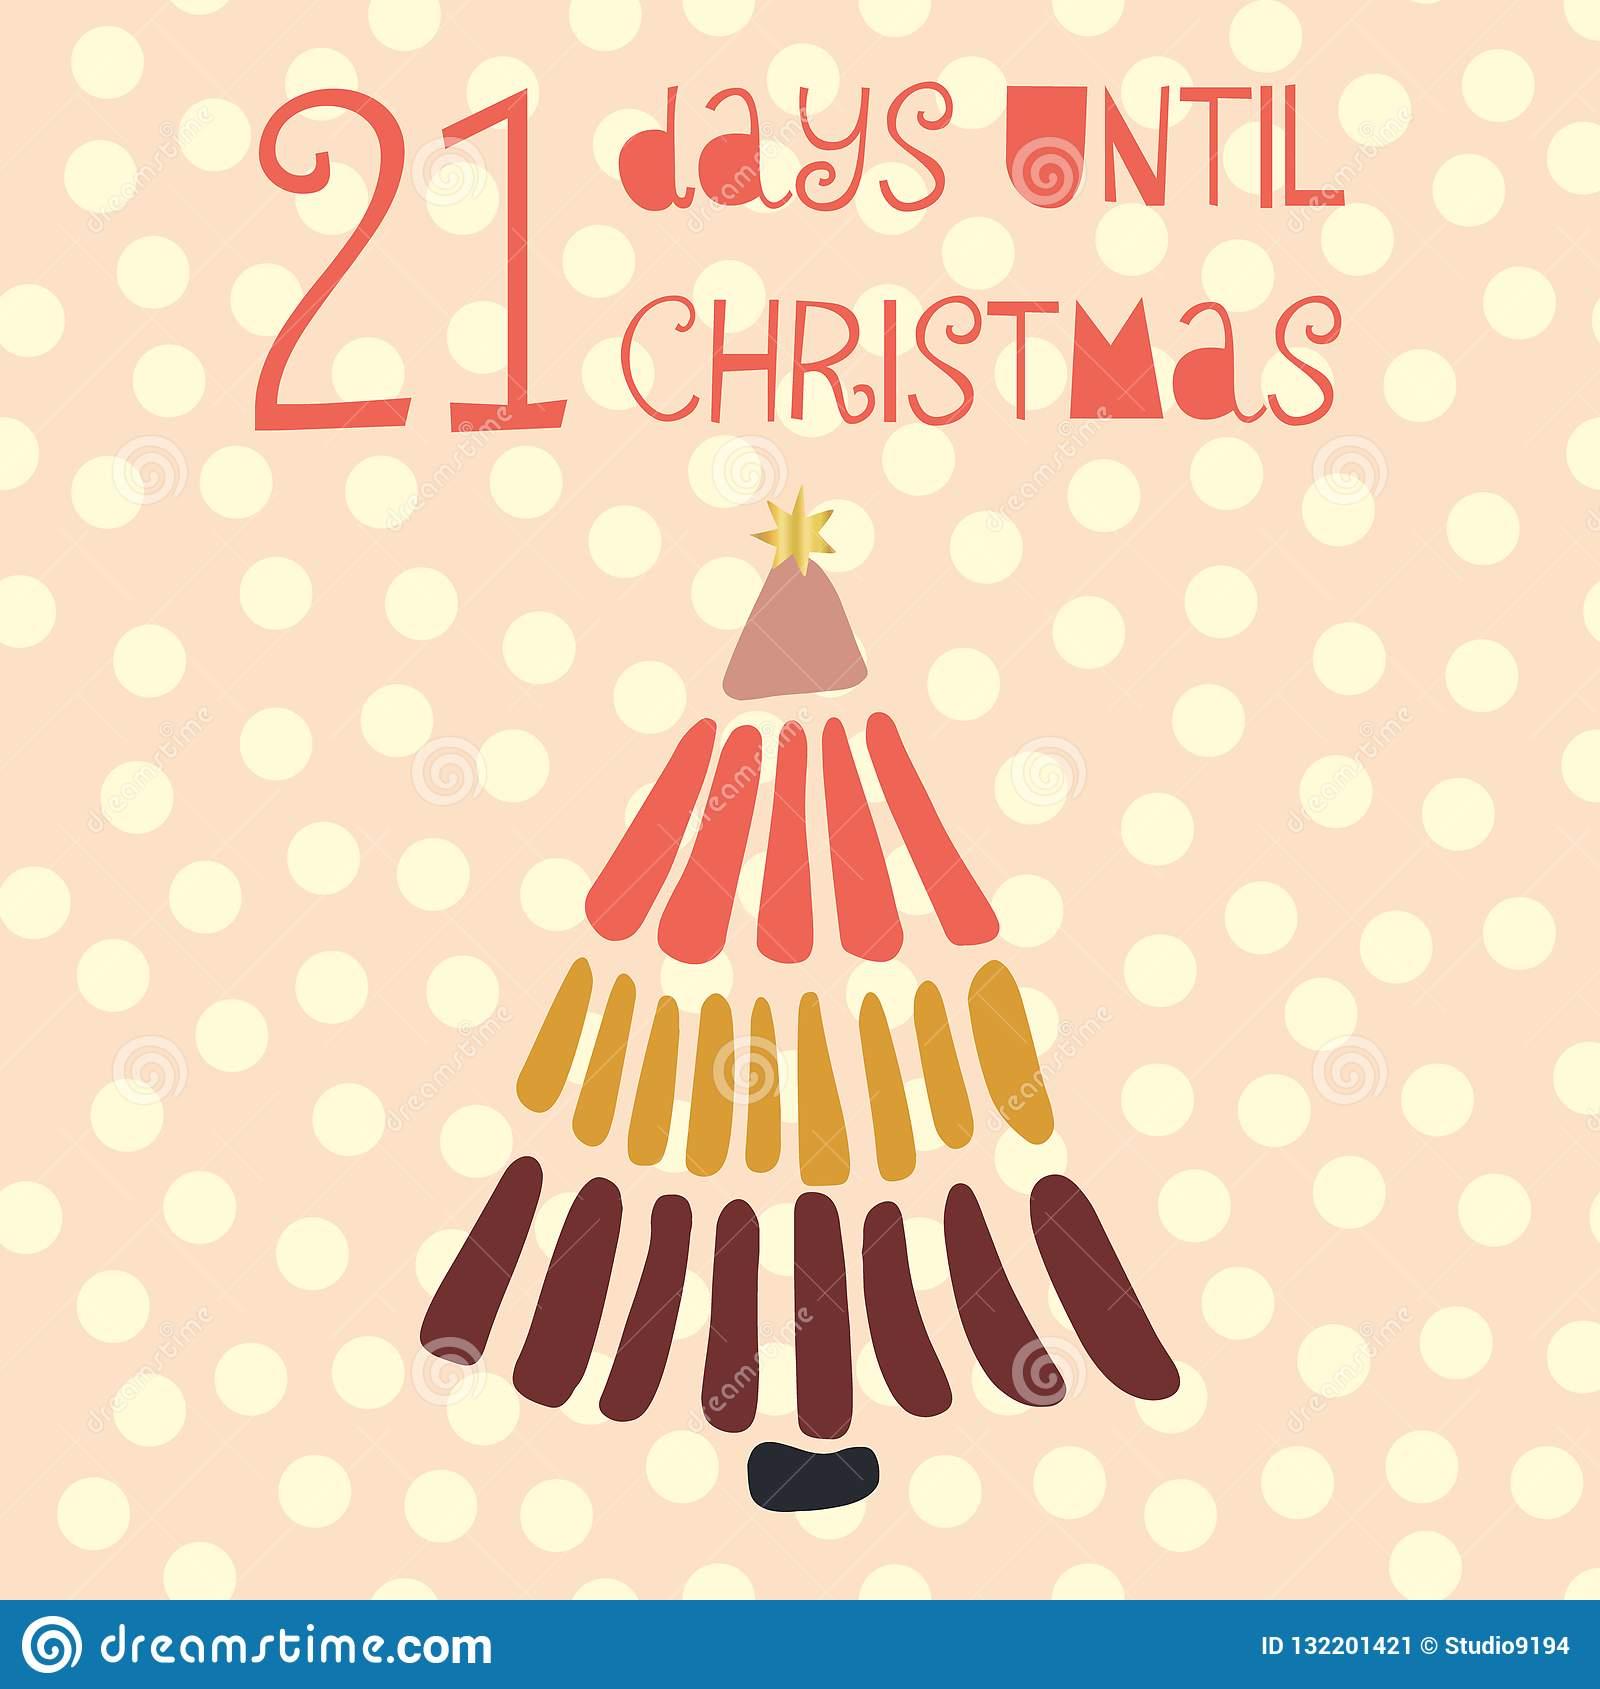 21 Days Until Christmas Vector Illustration. Christmas